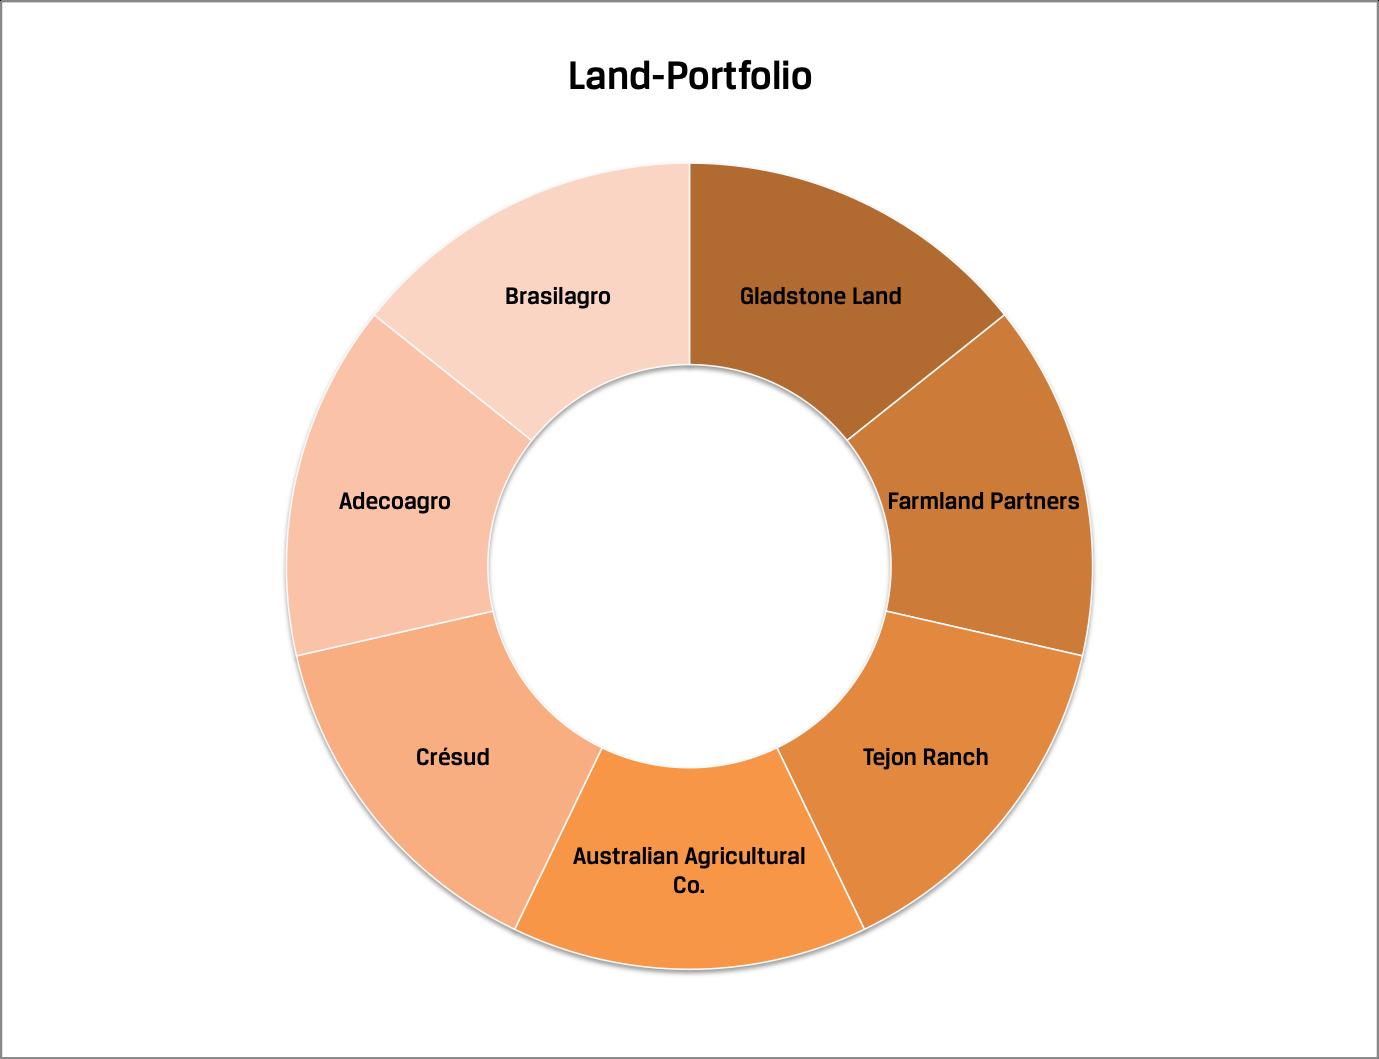 Land-Portfolio